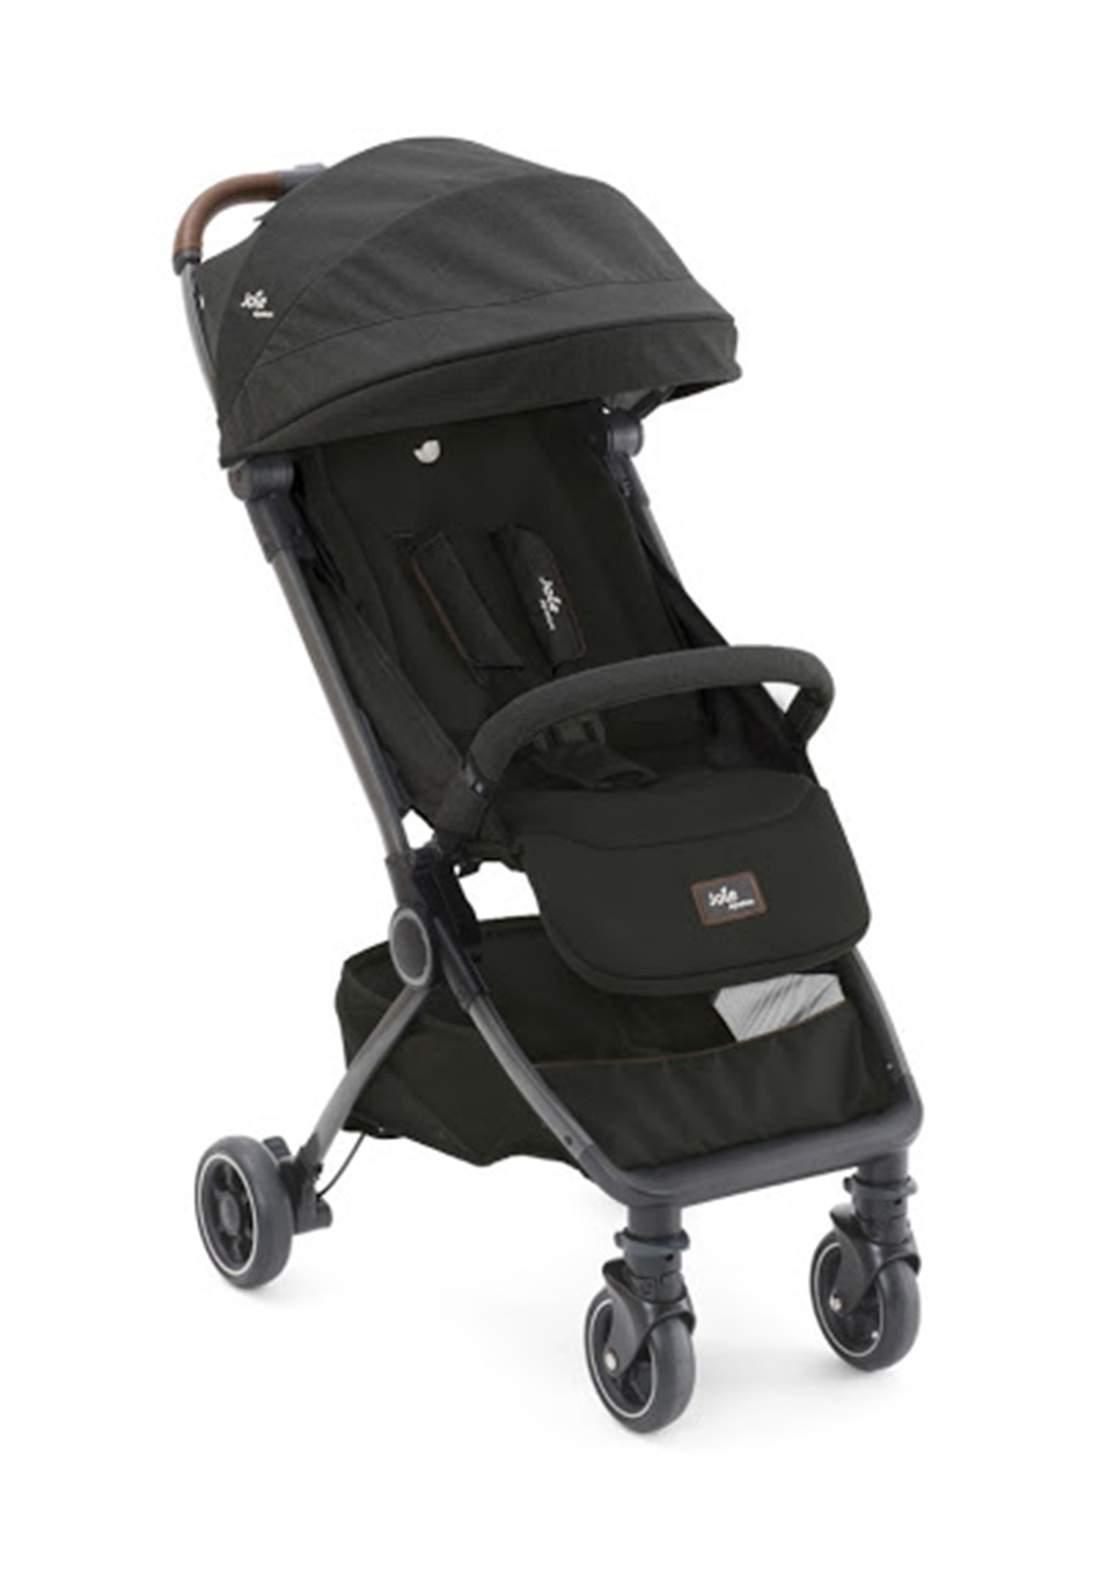 عربة اطفال Joie Baby Pact Flex Signature Stroller - Nori